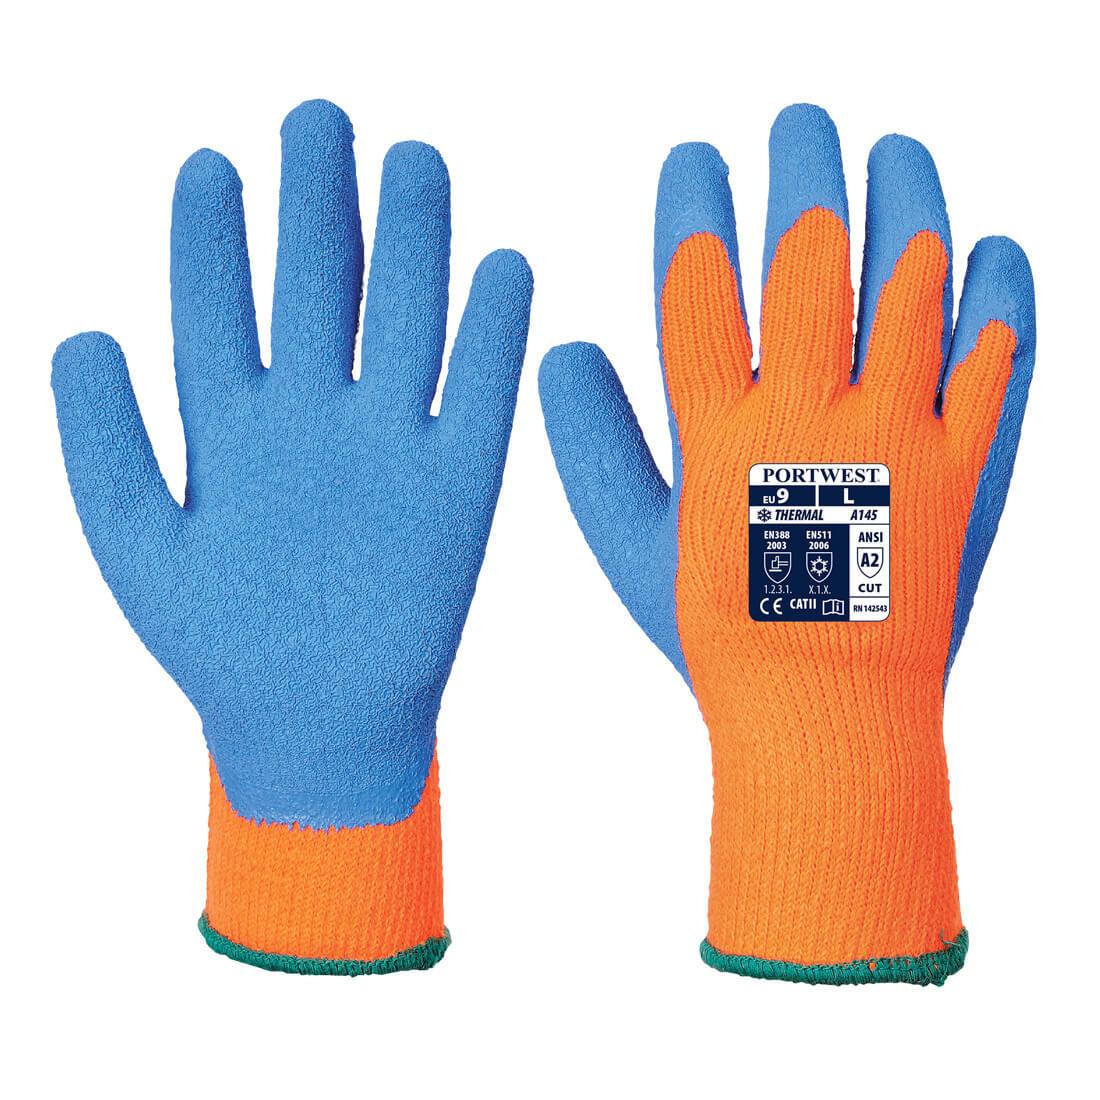 Manusa Cold Grip - Echipamente de protectie personala